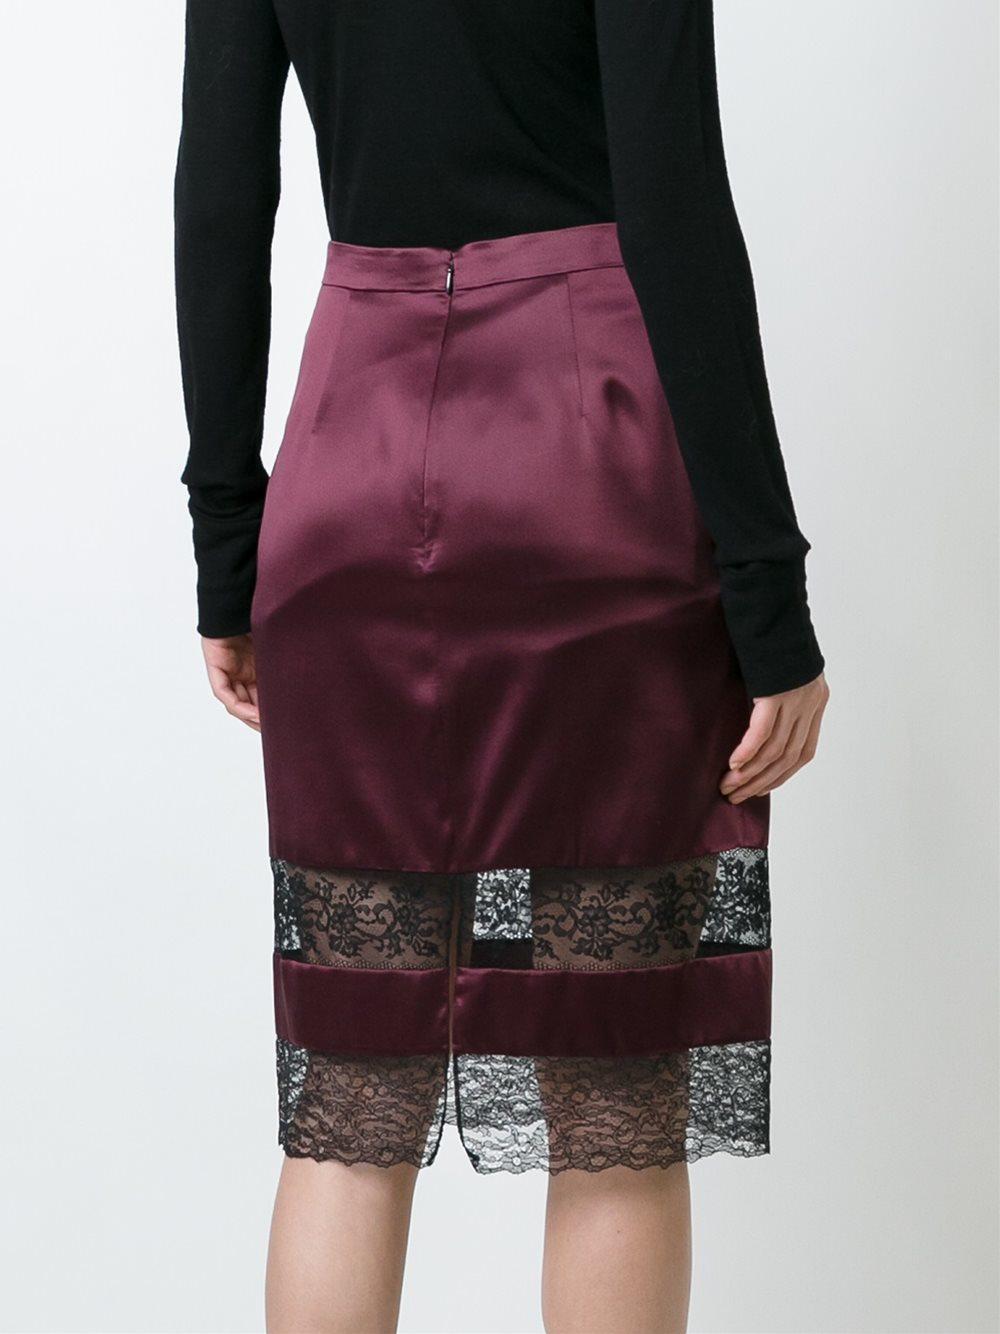 95e0e574da Givenchy - Red Lace Panel Pencil Skirt - Lyst. View fullscreen